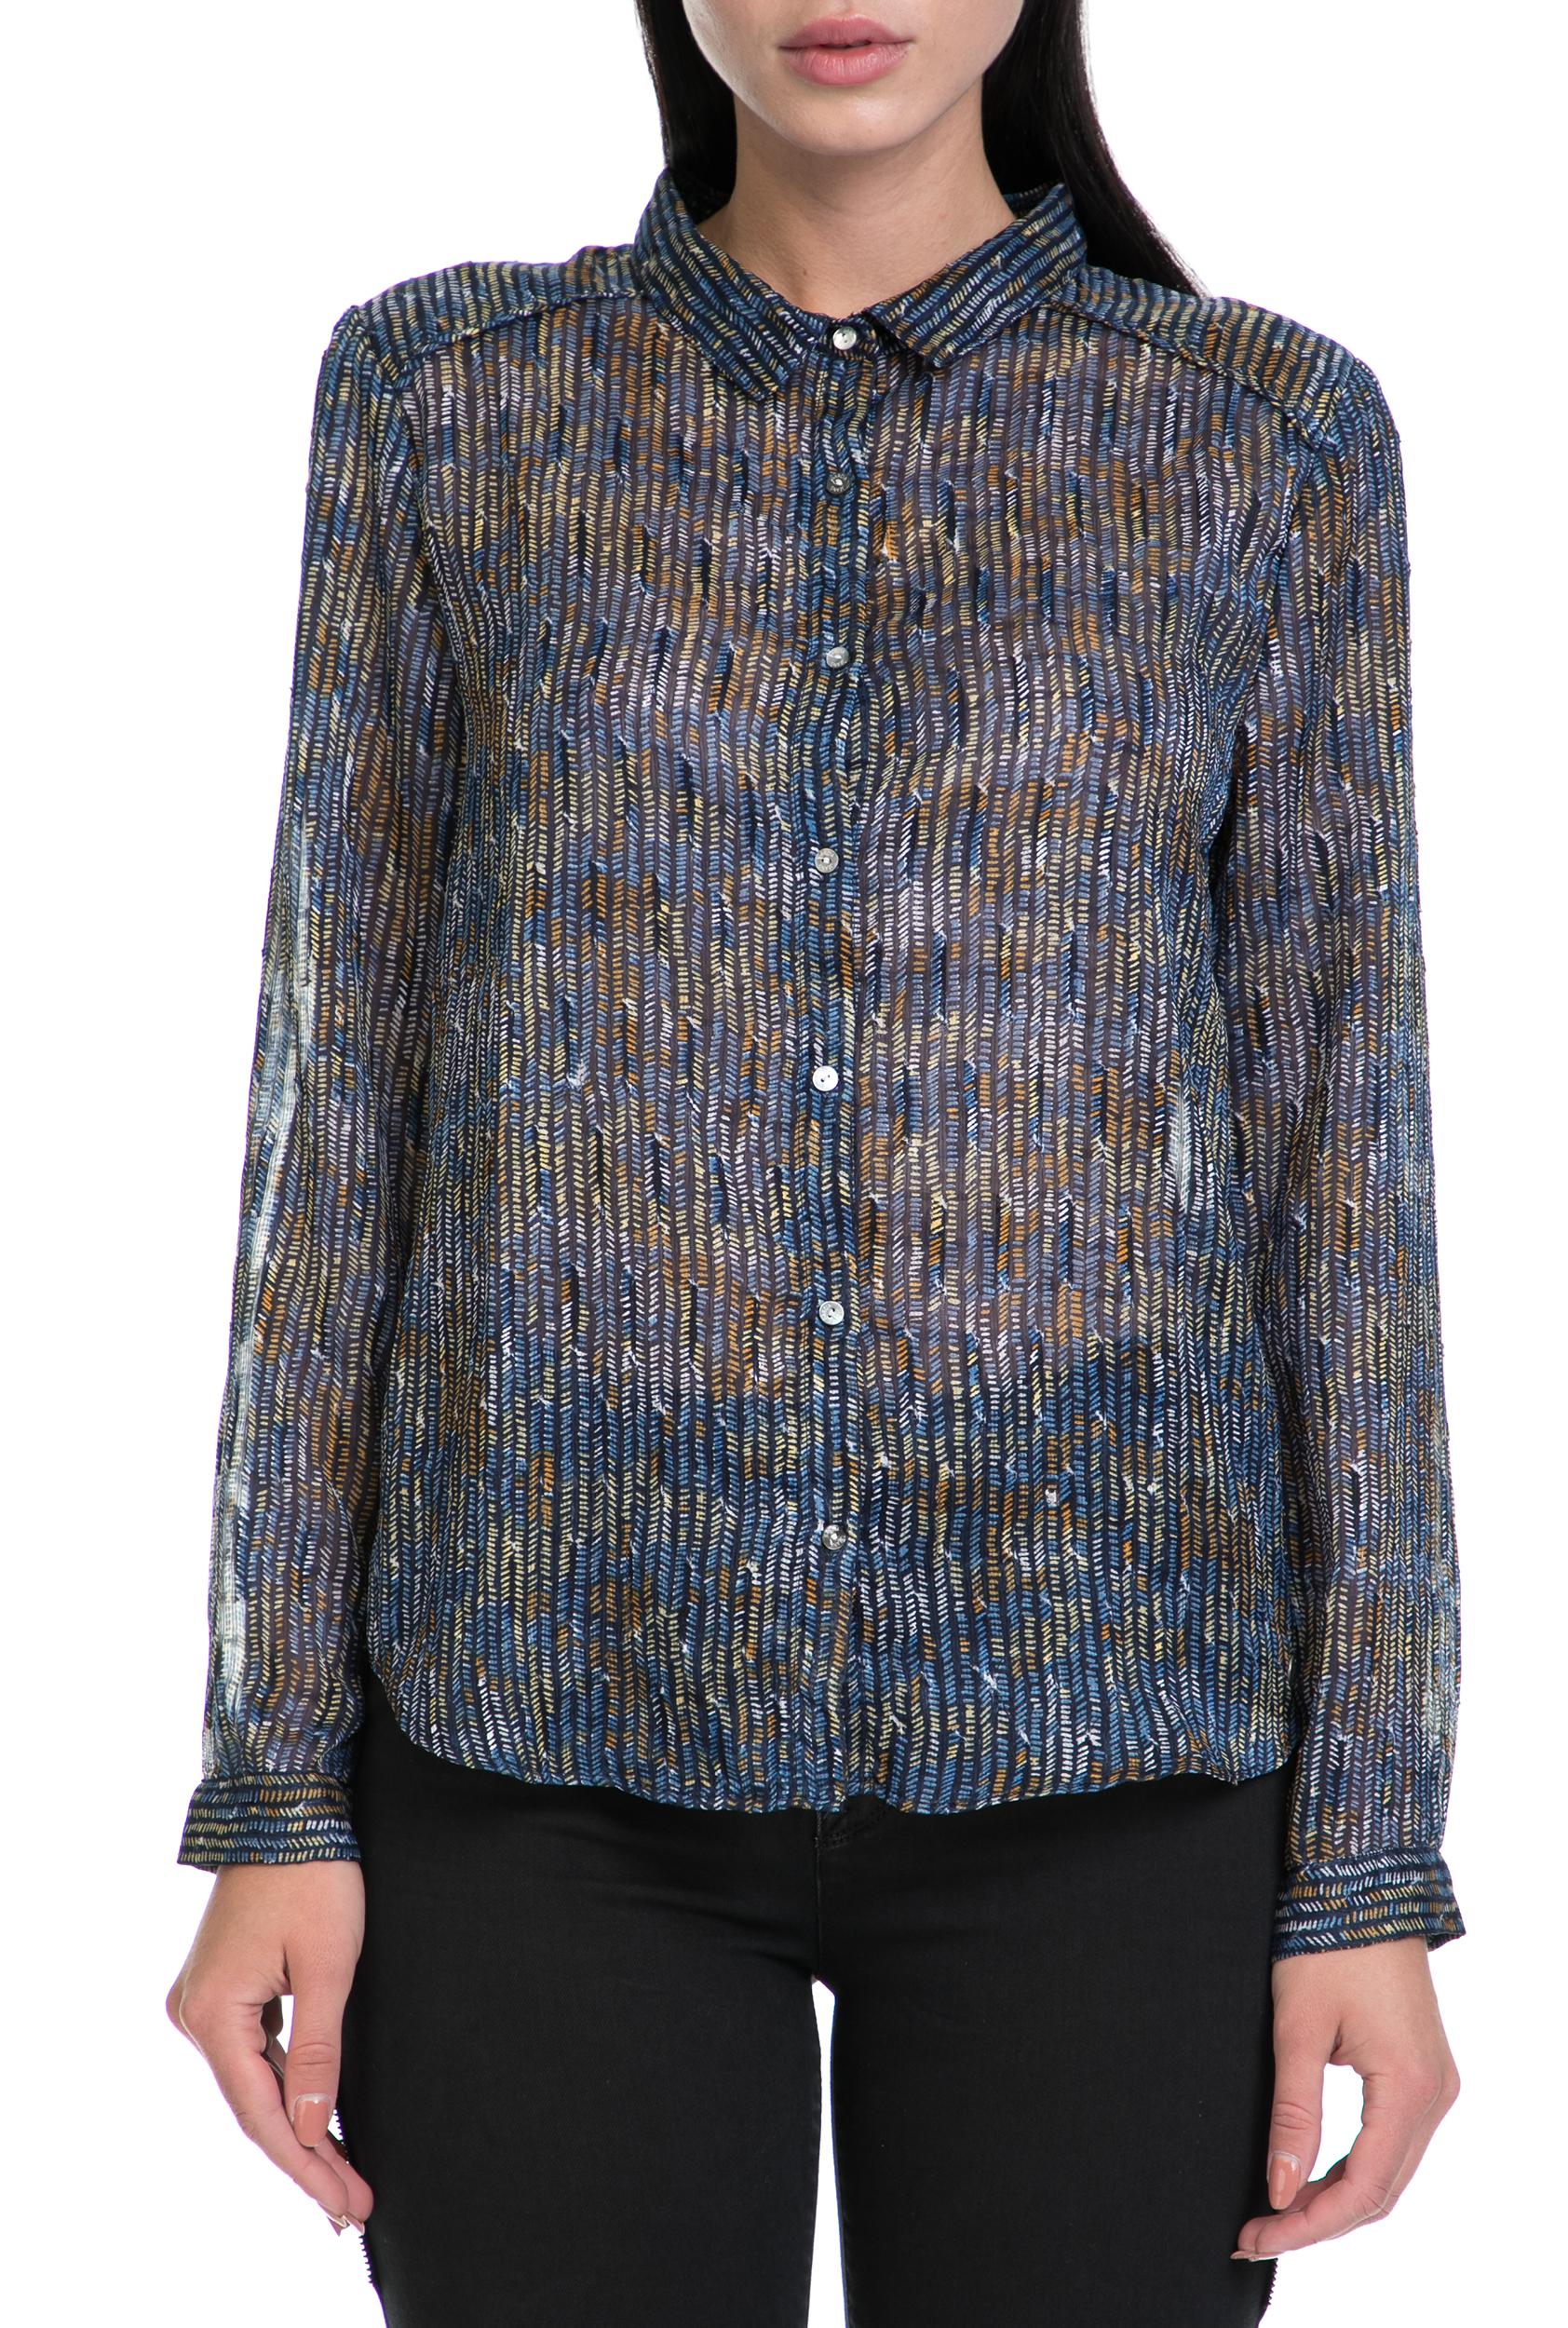 GARCIA JEANS - Γυναικείο πουκάμισο GARCIA JEANS μπλε-καφέ γυναικεία ρούχα πουκάμισα μακρυμάνικα